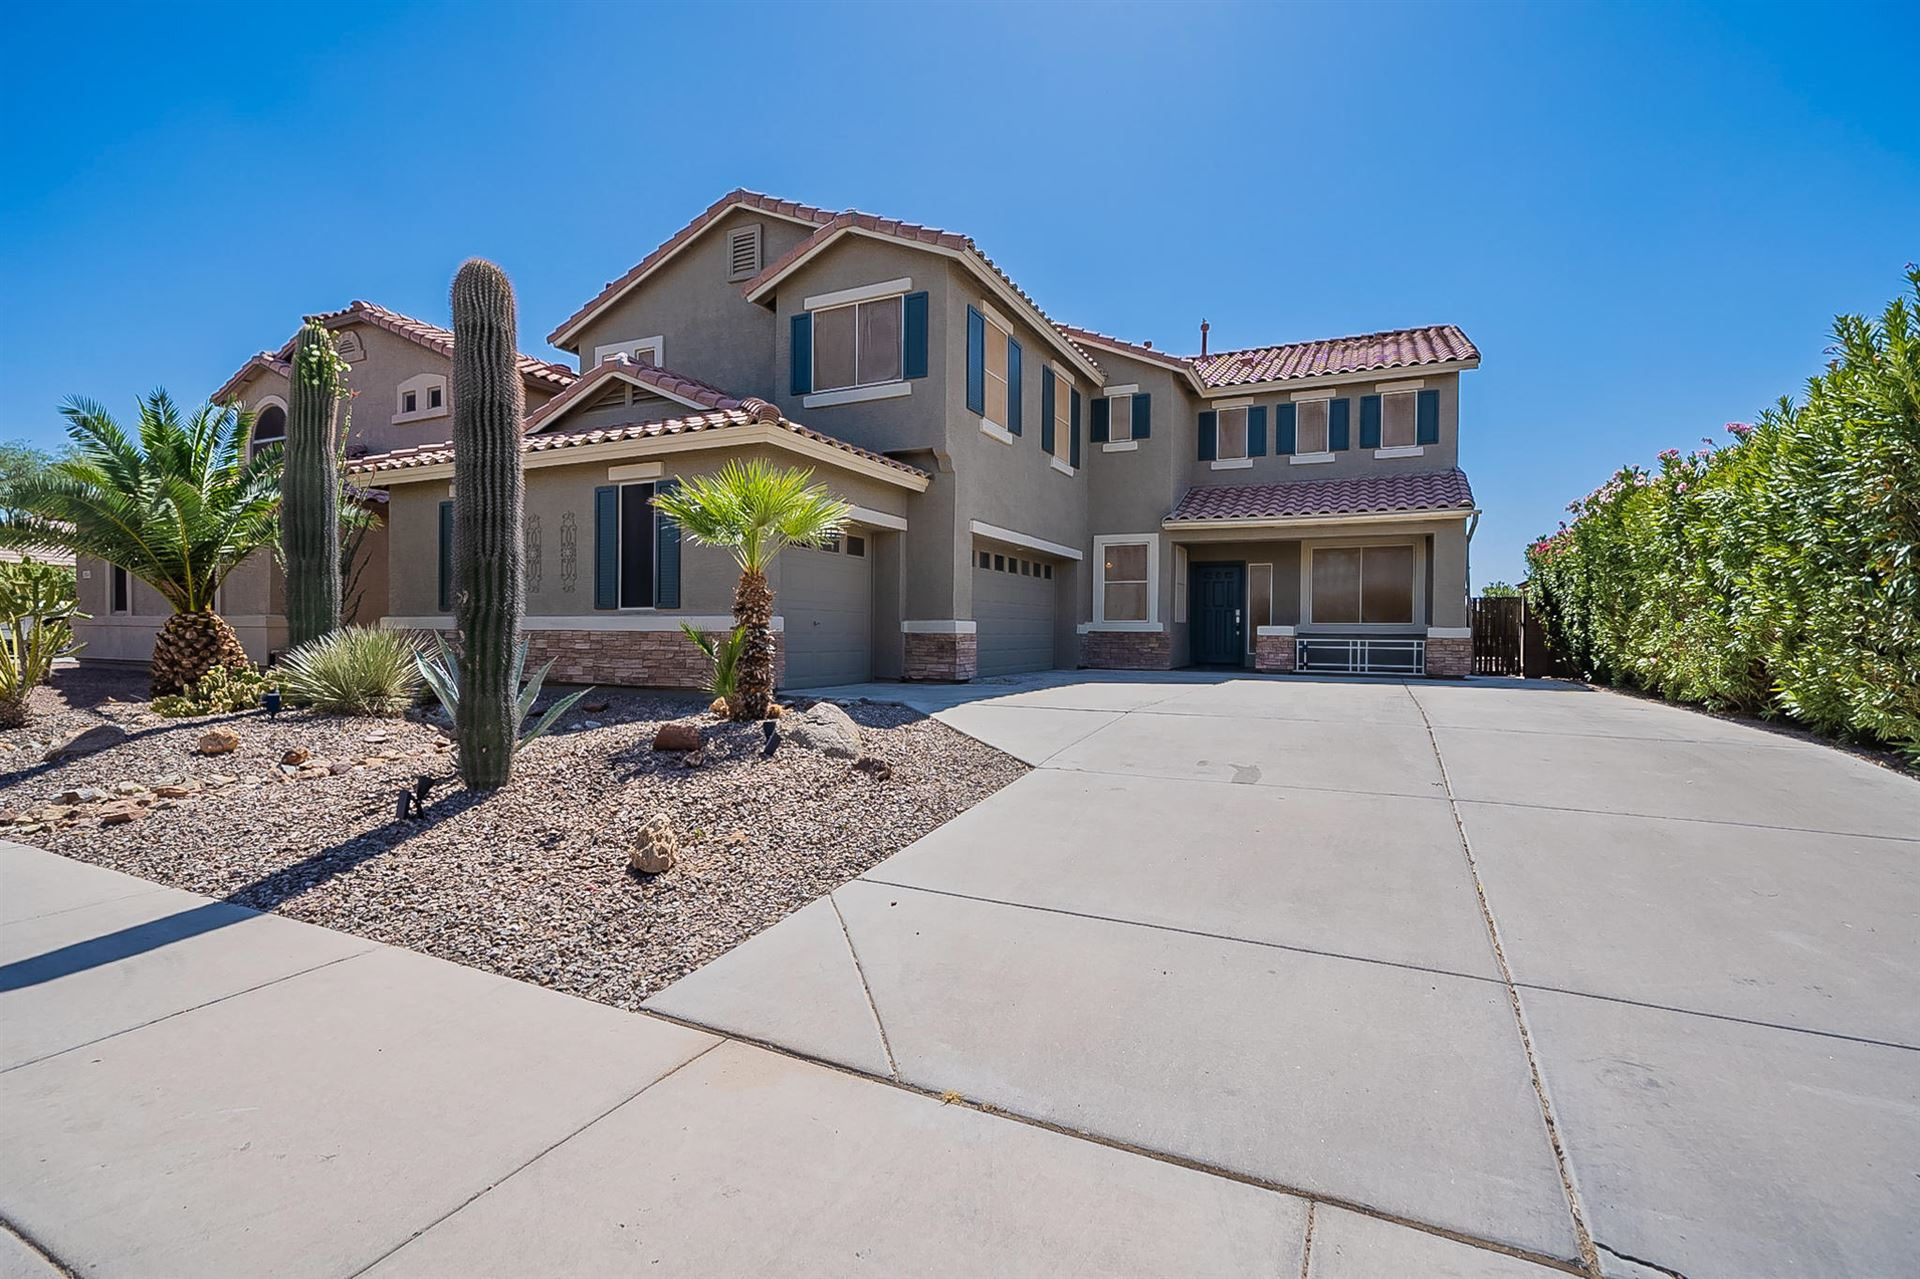 Photo for 21568 N BACKUS Drive, Maricopa, AZ 85138 (MLS # 6223974)